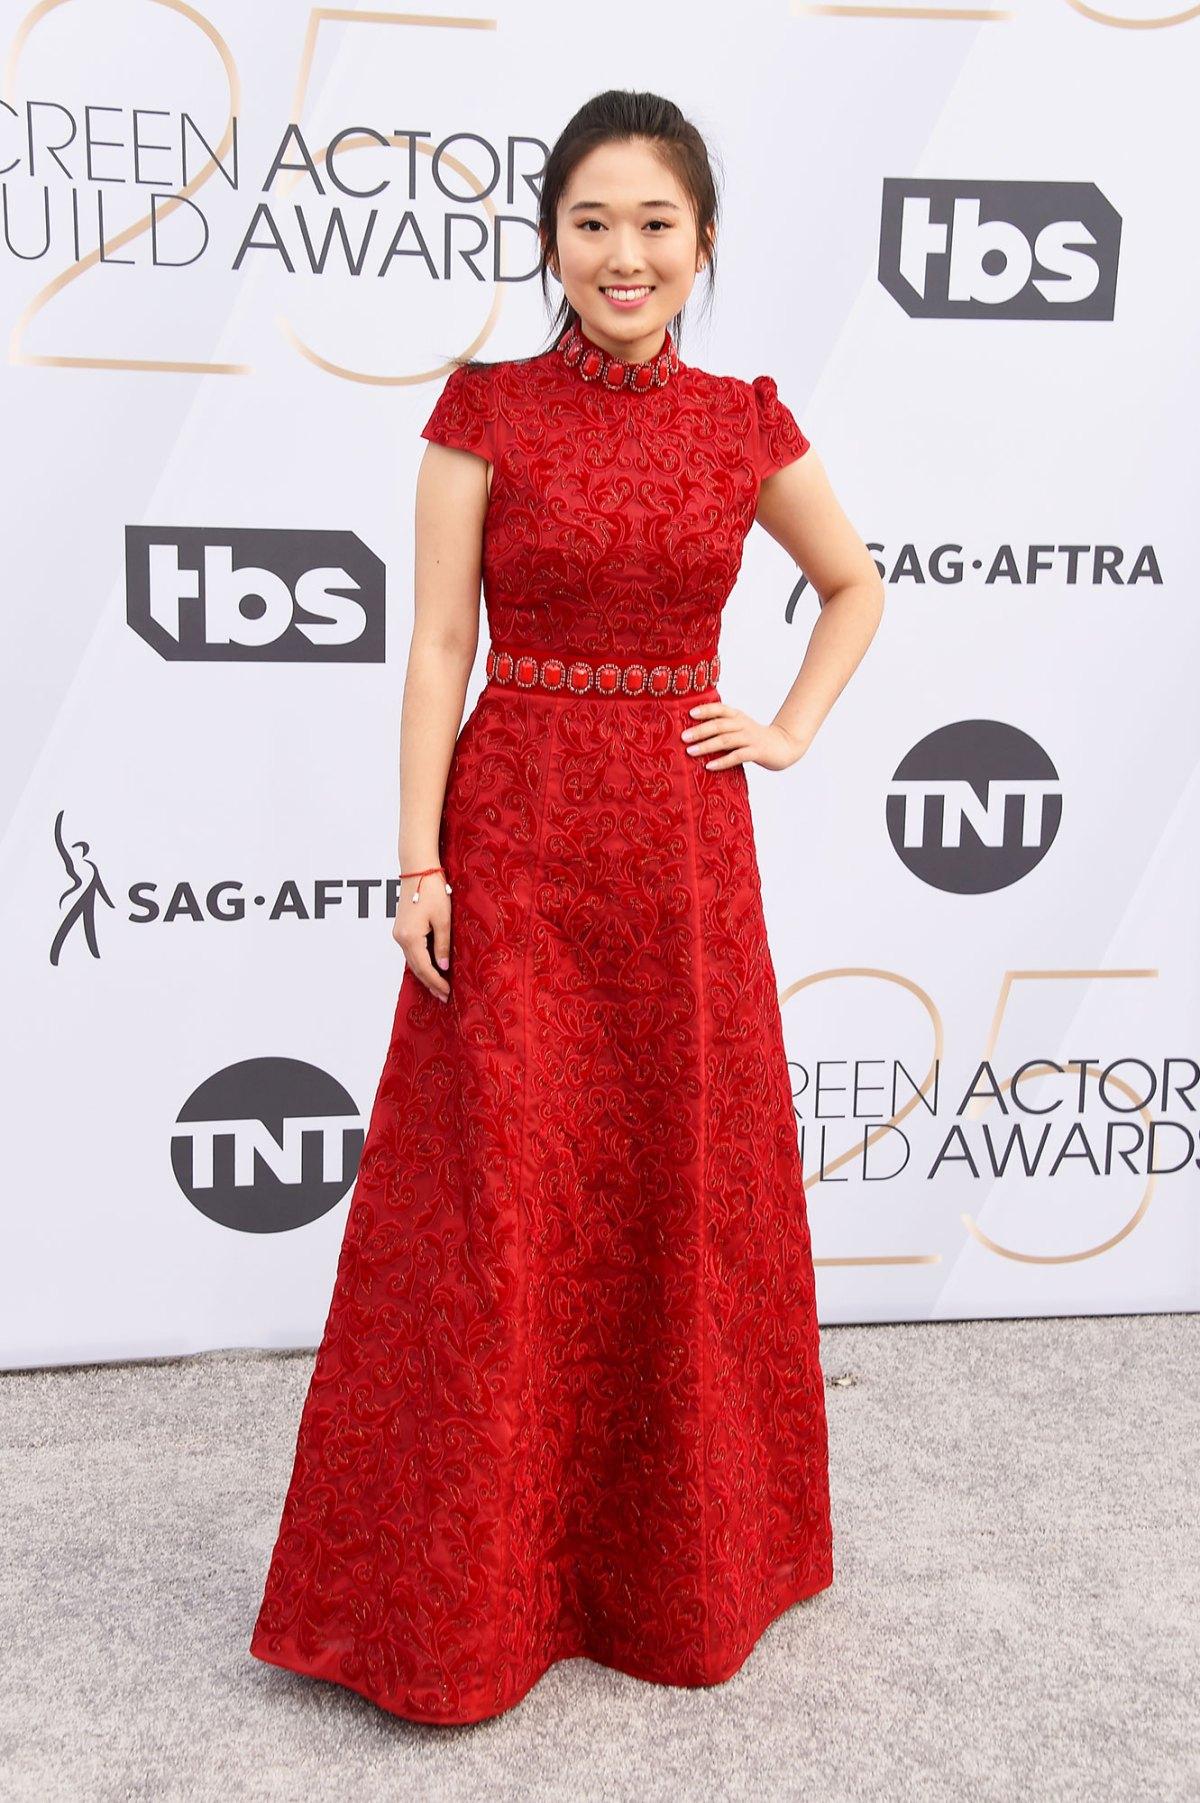 c5df67b60eeb SAG Awards 2019 Red Carpet Fashion: See Celeb Dresses, Gowns